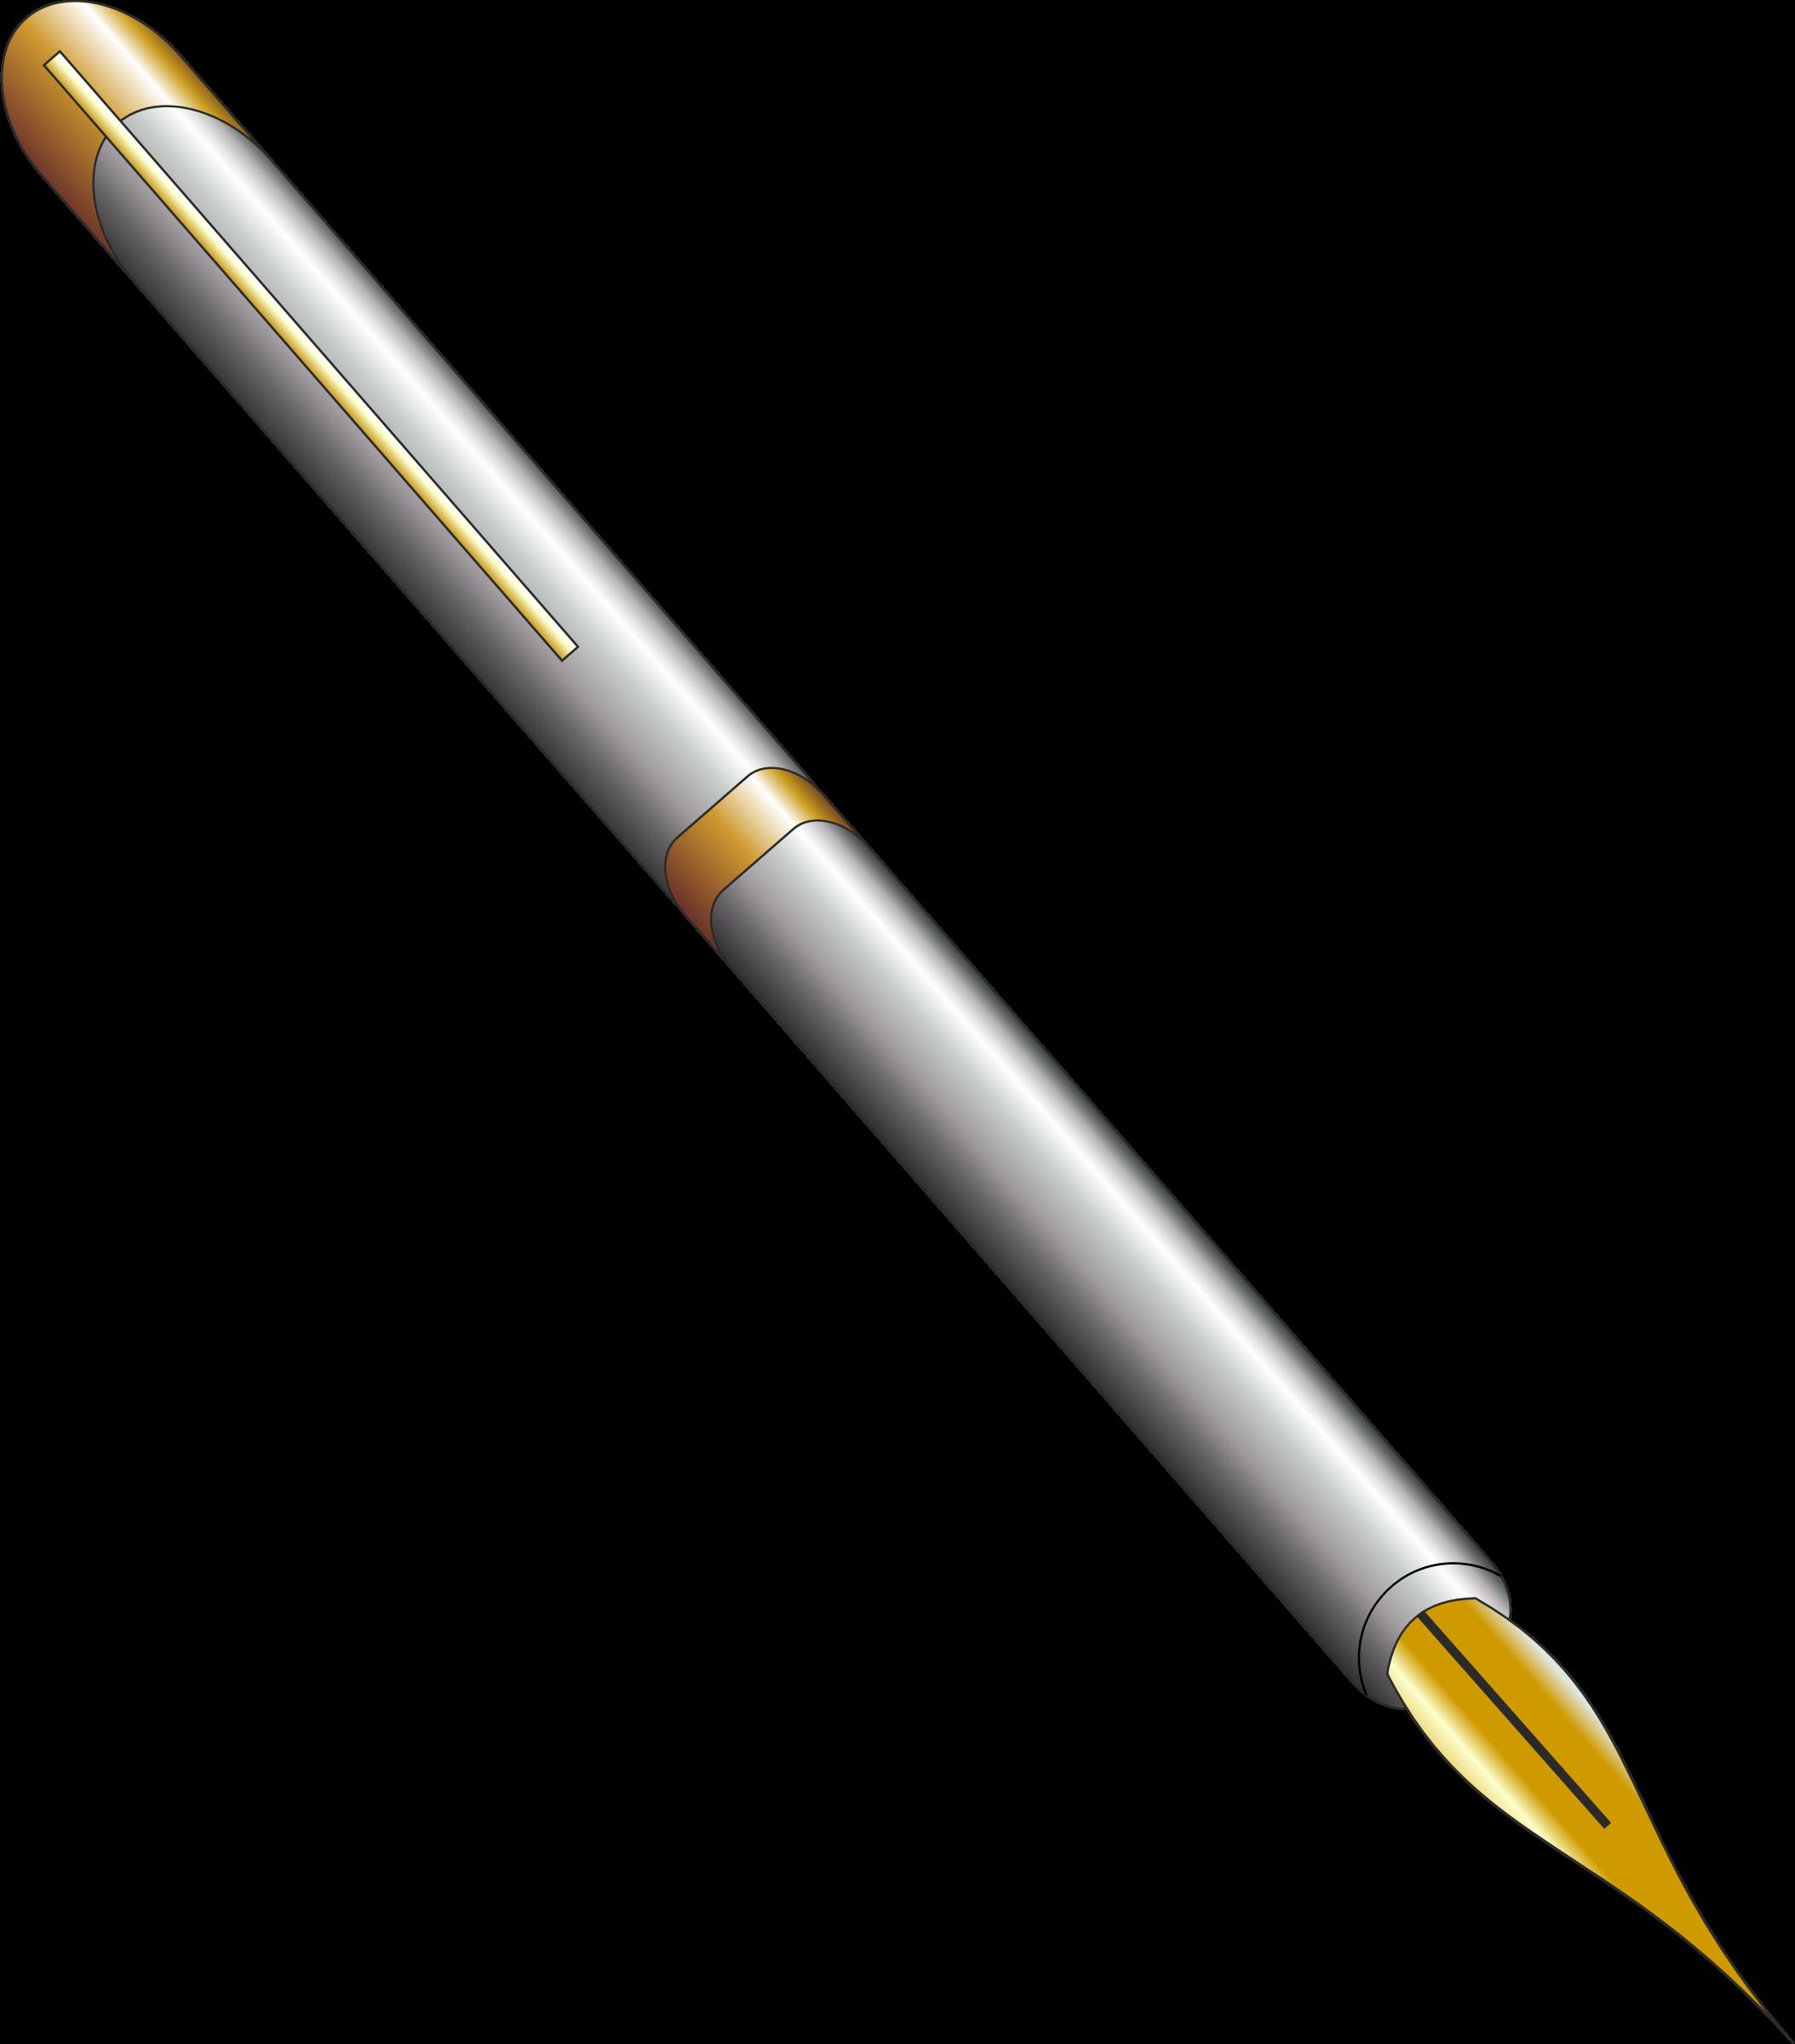 Clipart writing pencil. Fountain pen big image